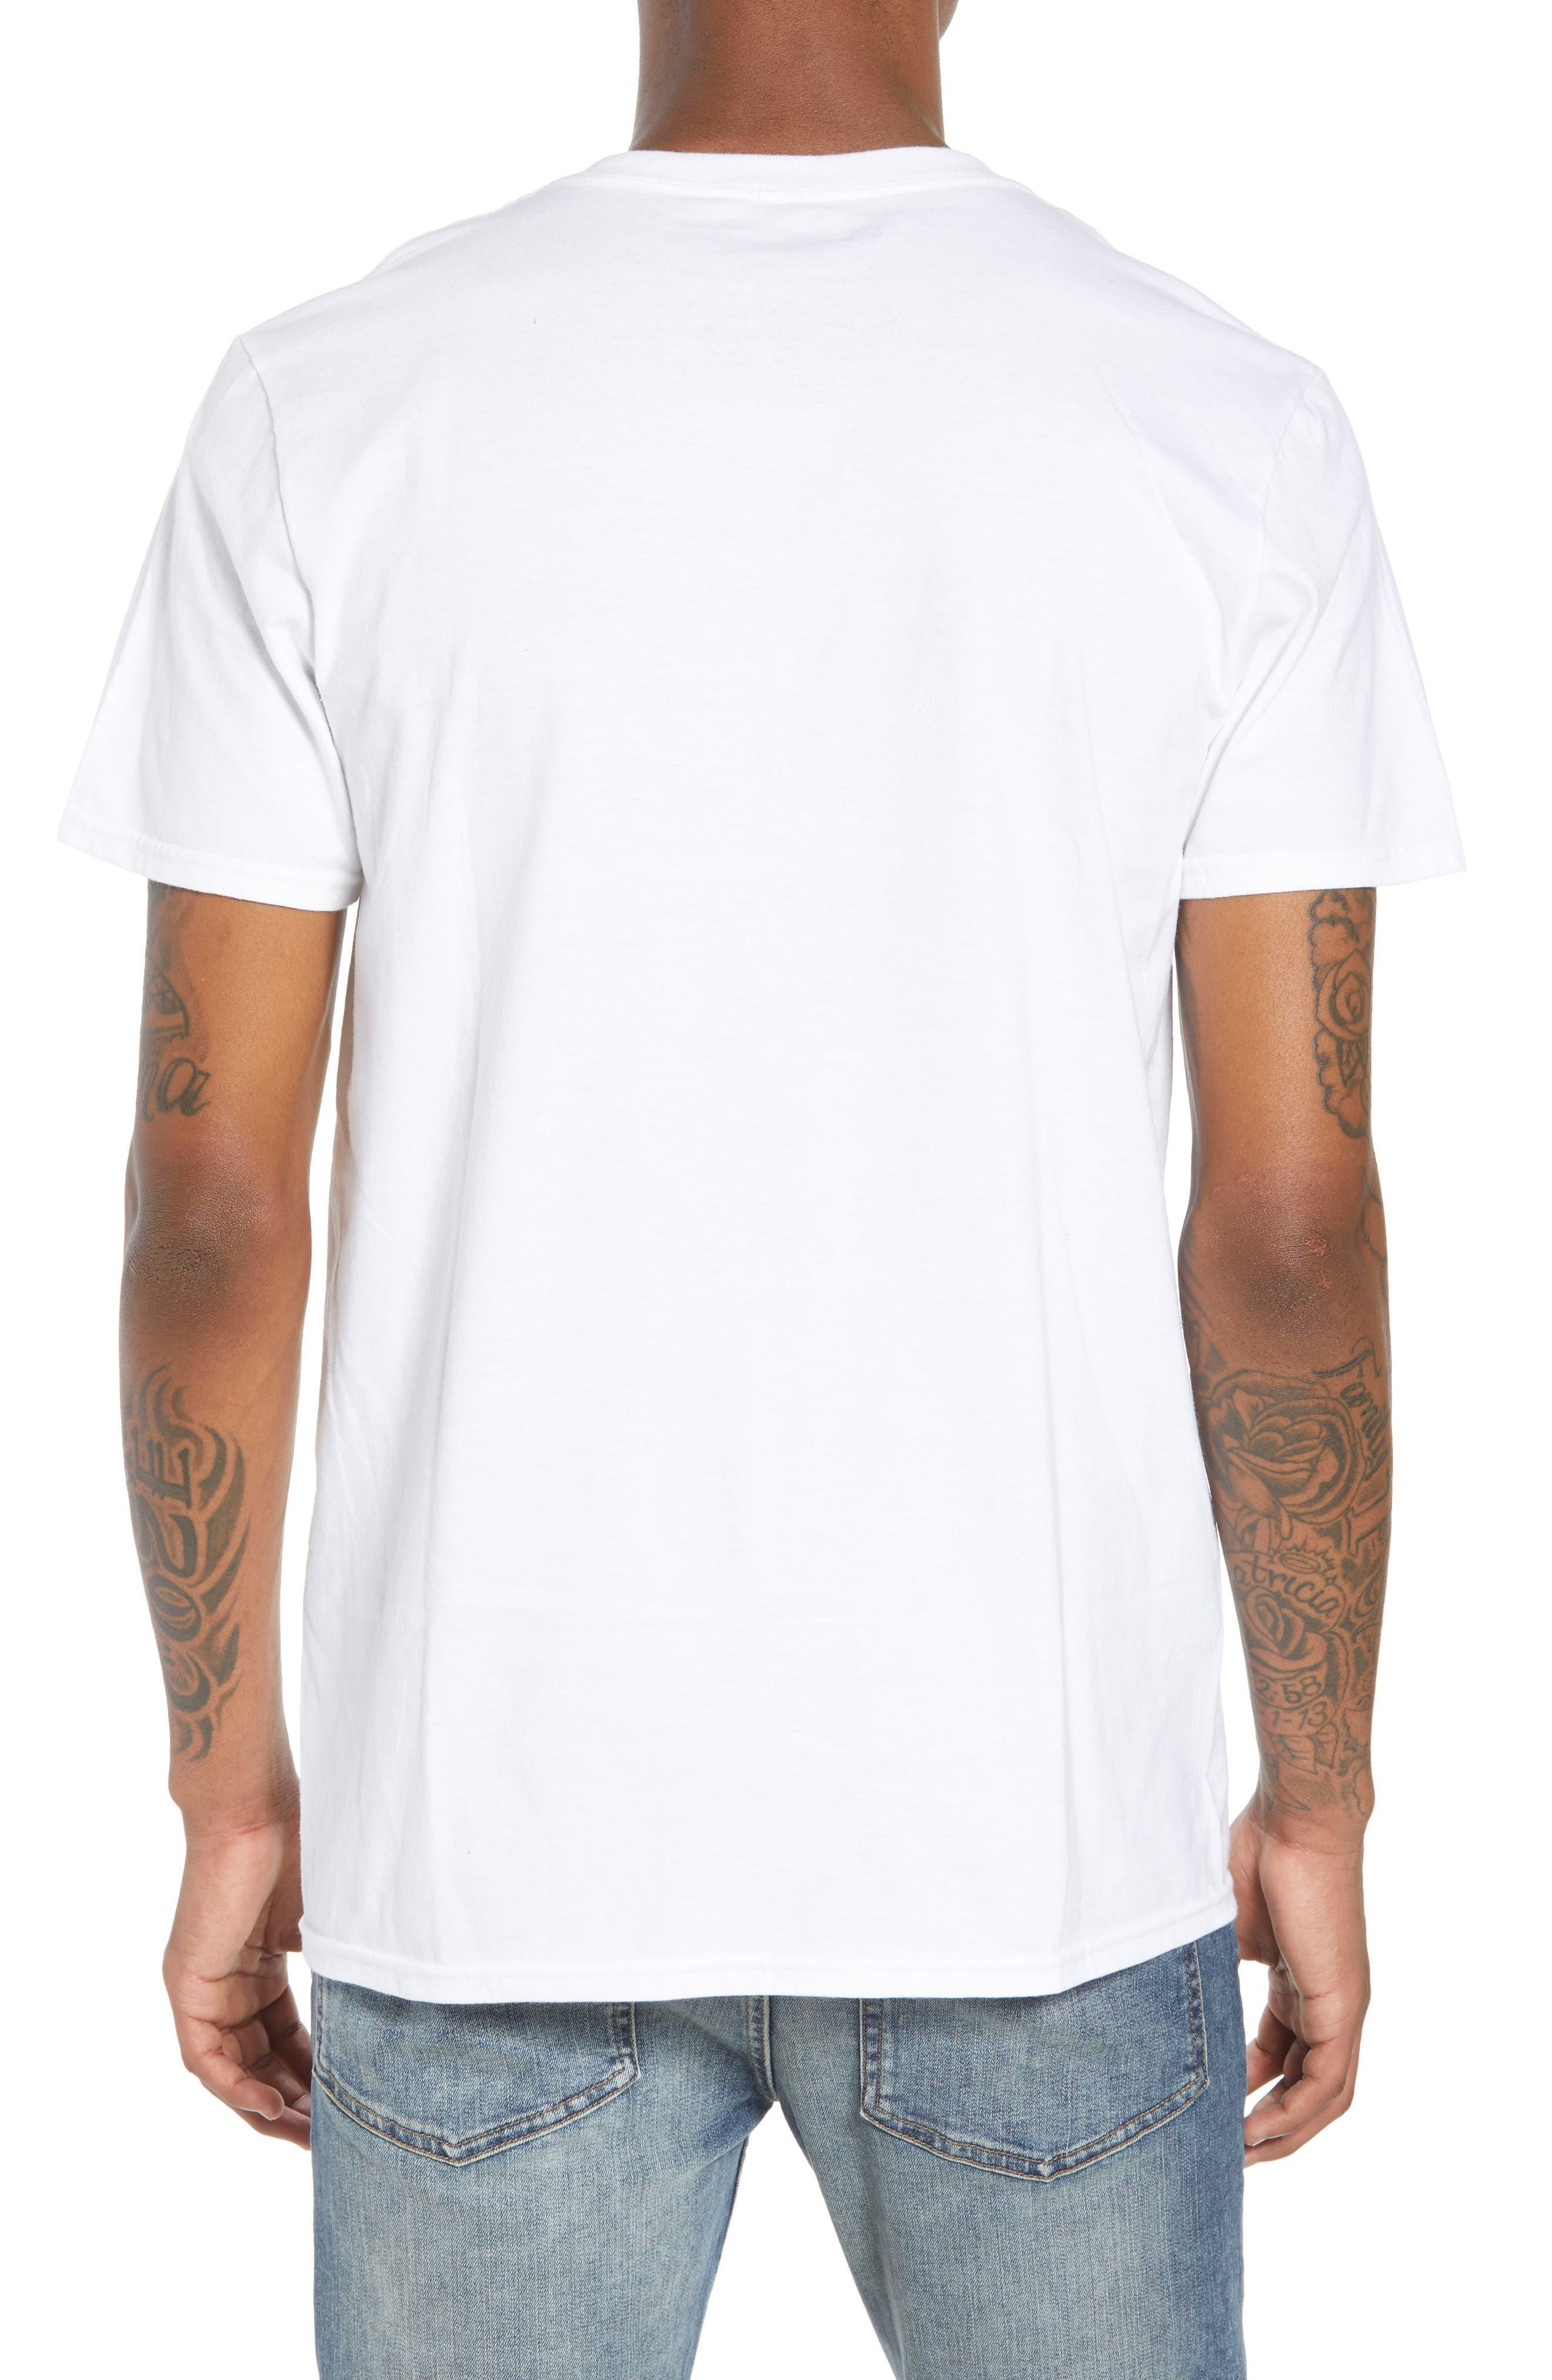 Tie Dye Smiley Face T-Shirt,                             Alternate thumbnail 2, color,                             White Tie Dye Smiley Face